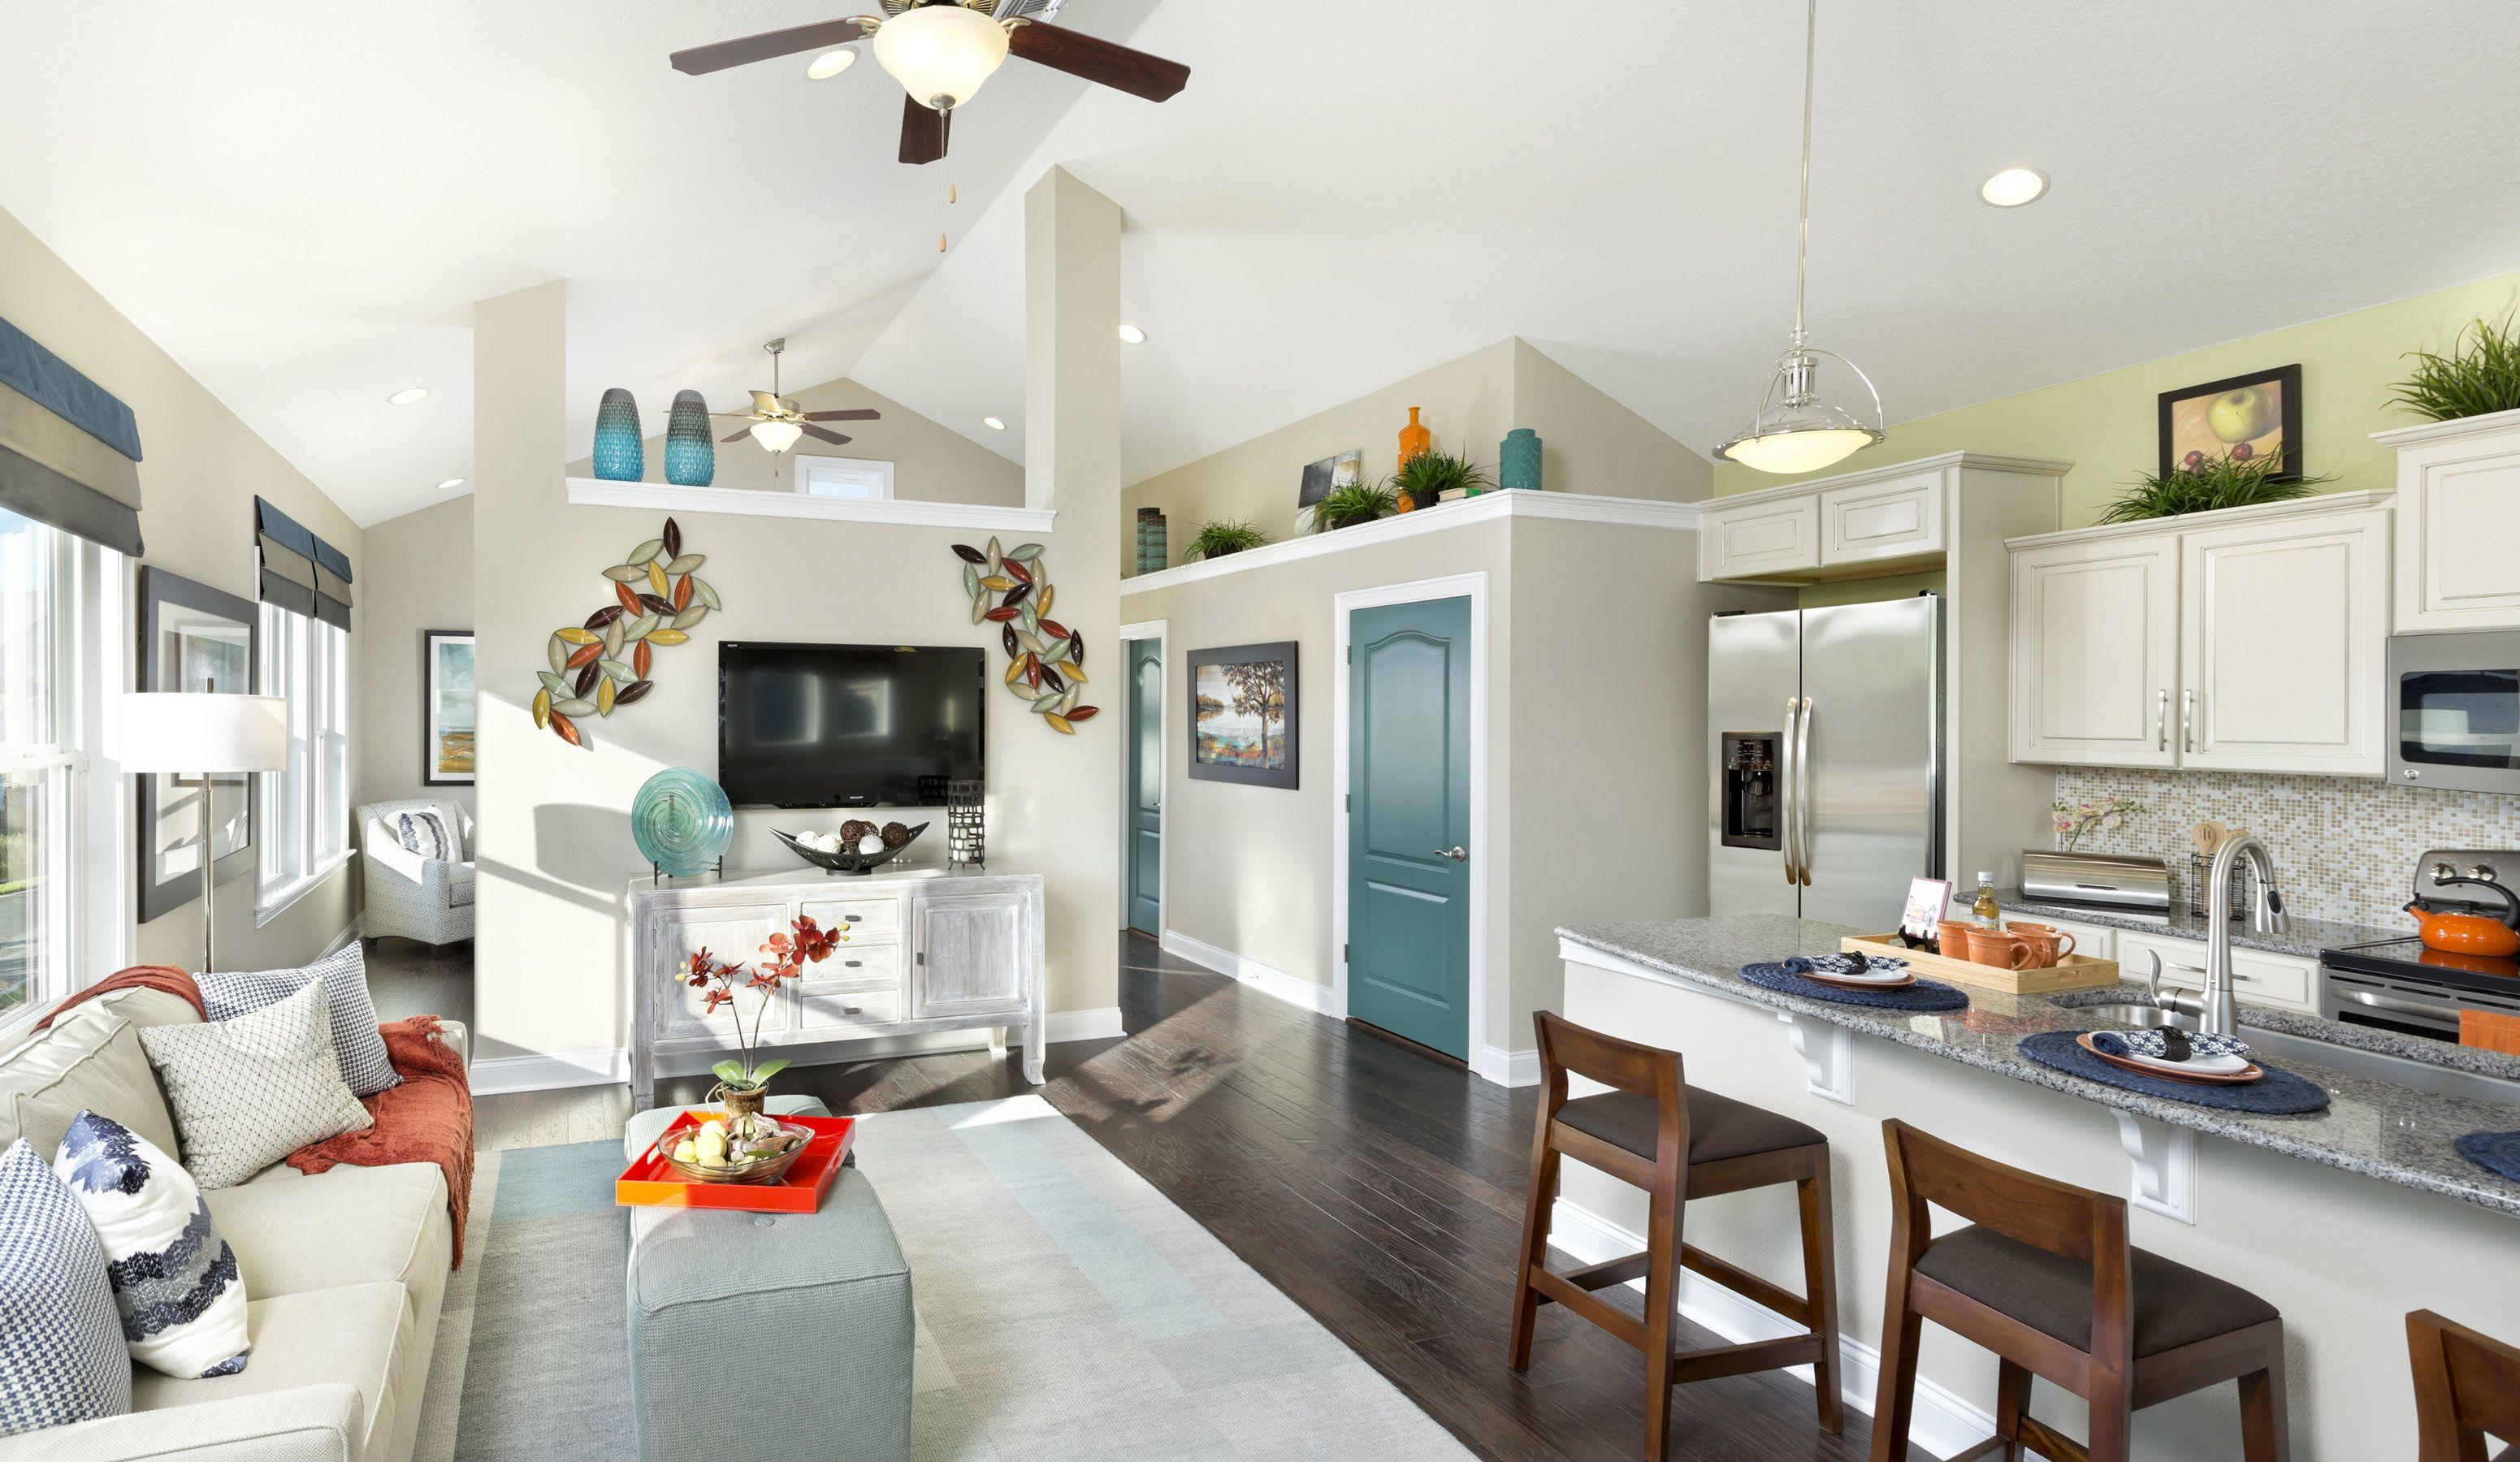 David Weekley Homes: The Reef floor plan. 4 bedrooms, 3.5 bath. This ...